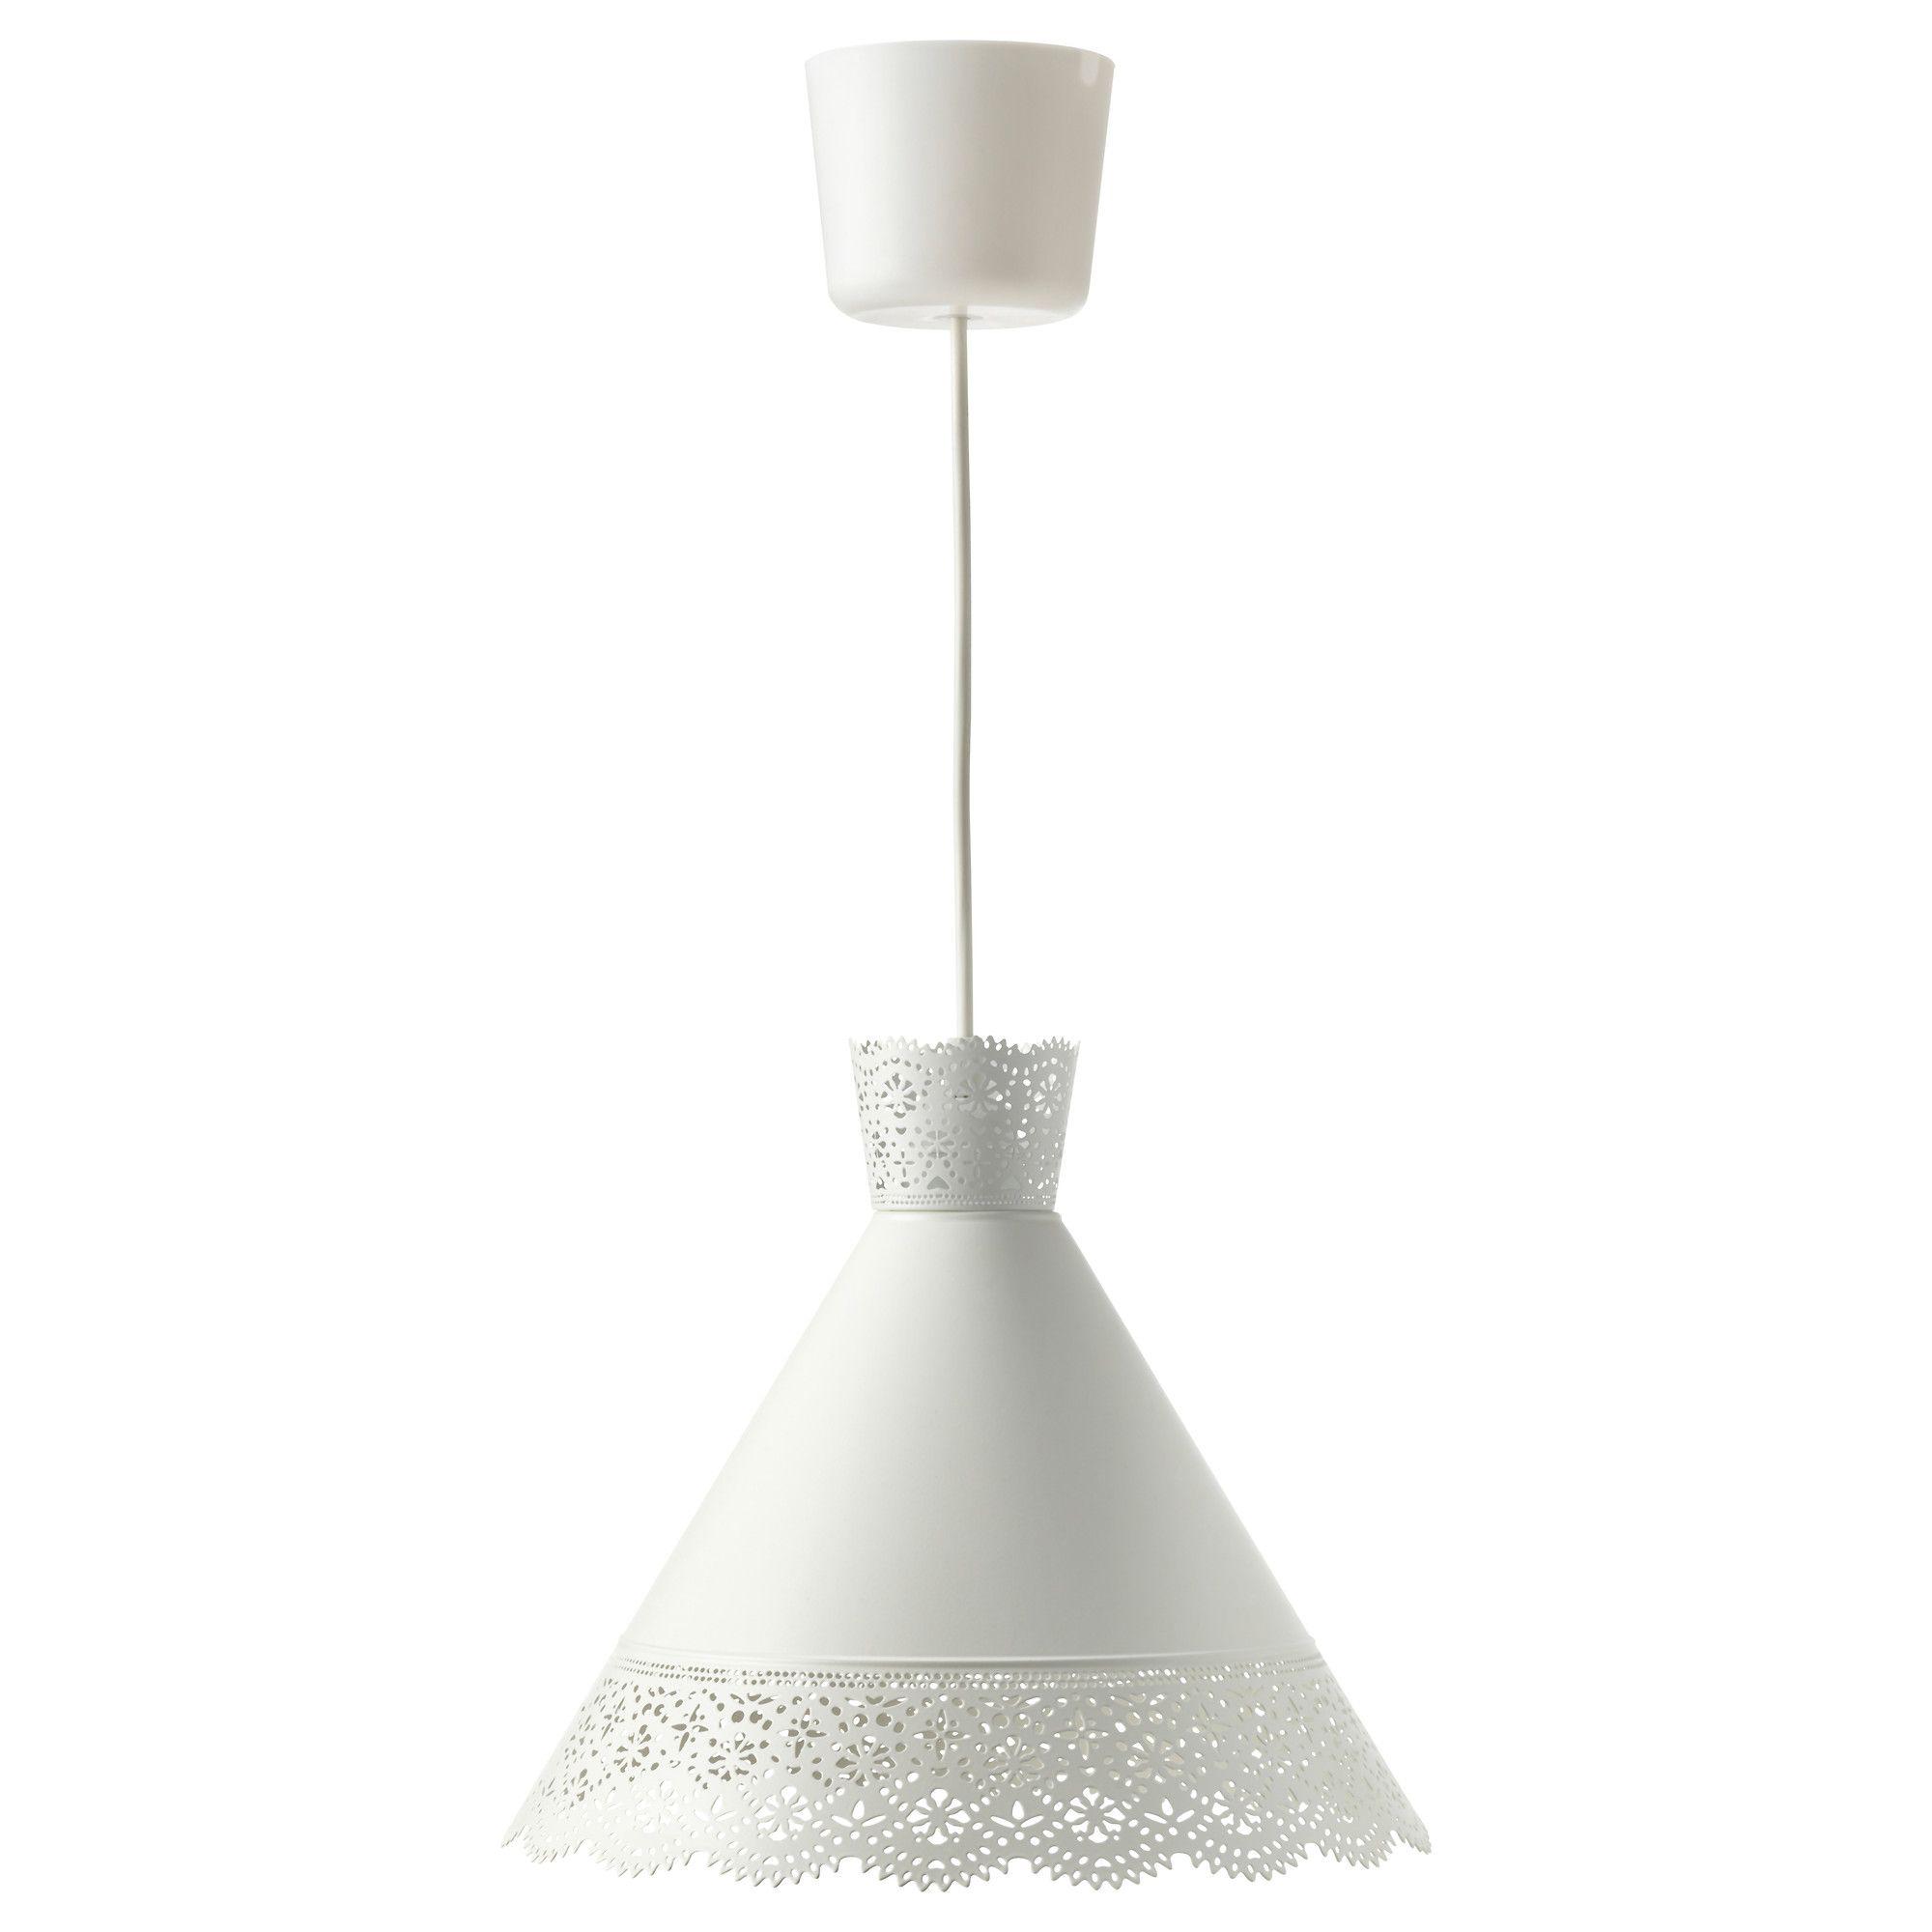 Mölndal pendant lamp house ikea jordan ikea ceiling light